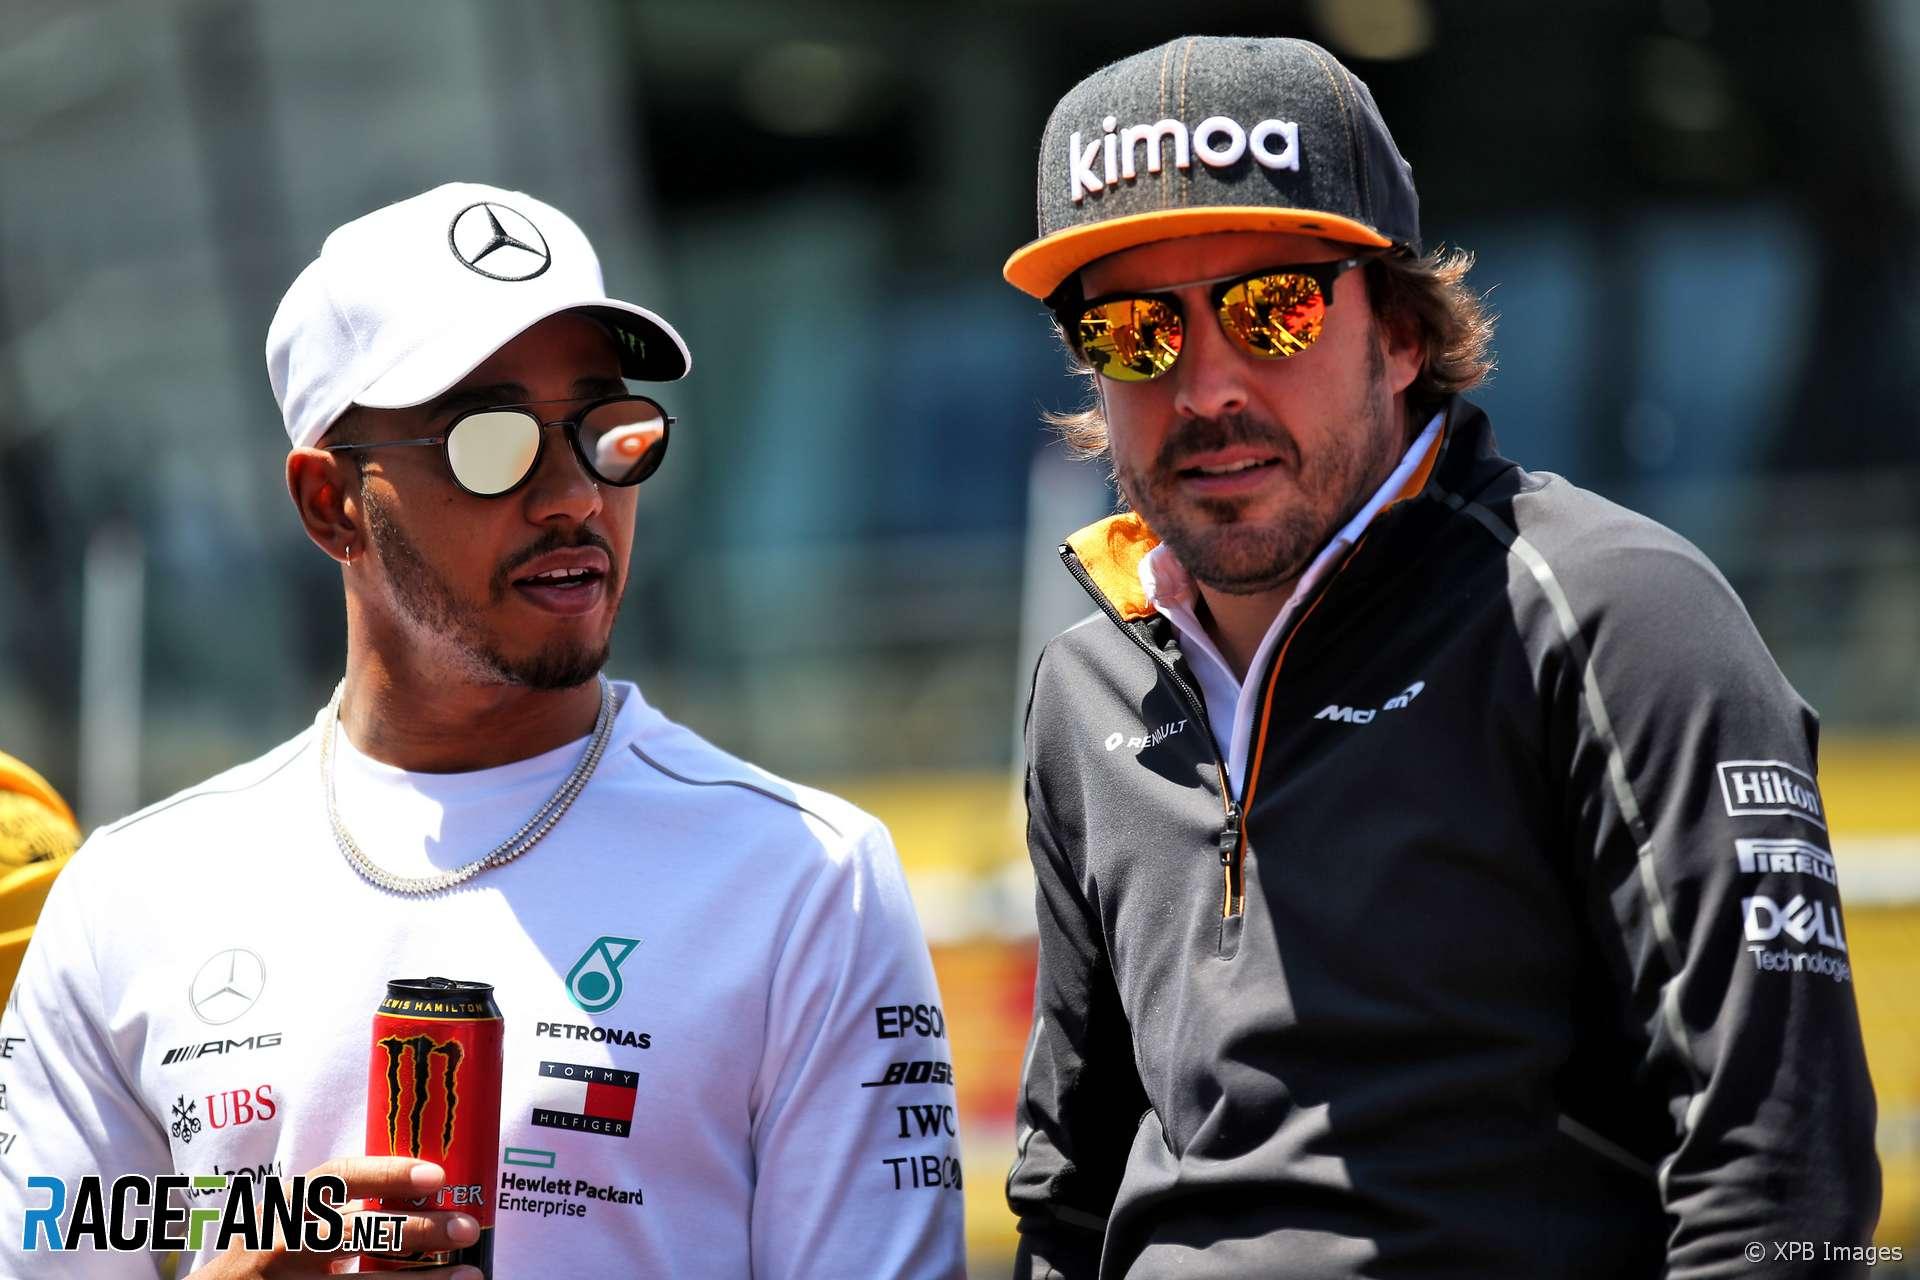 Fernando Alonso, Lewis Hamilton, Red Bull Ring, 2018